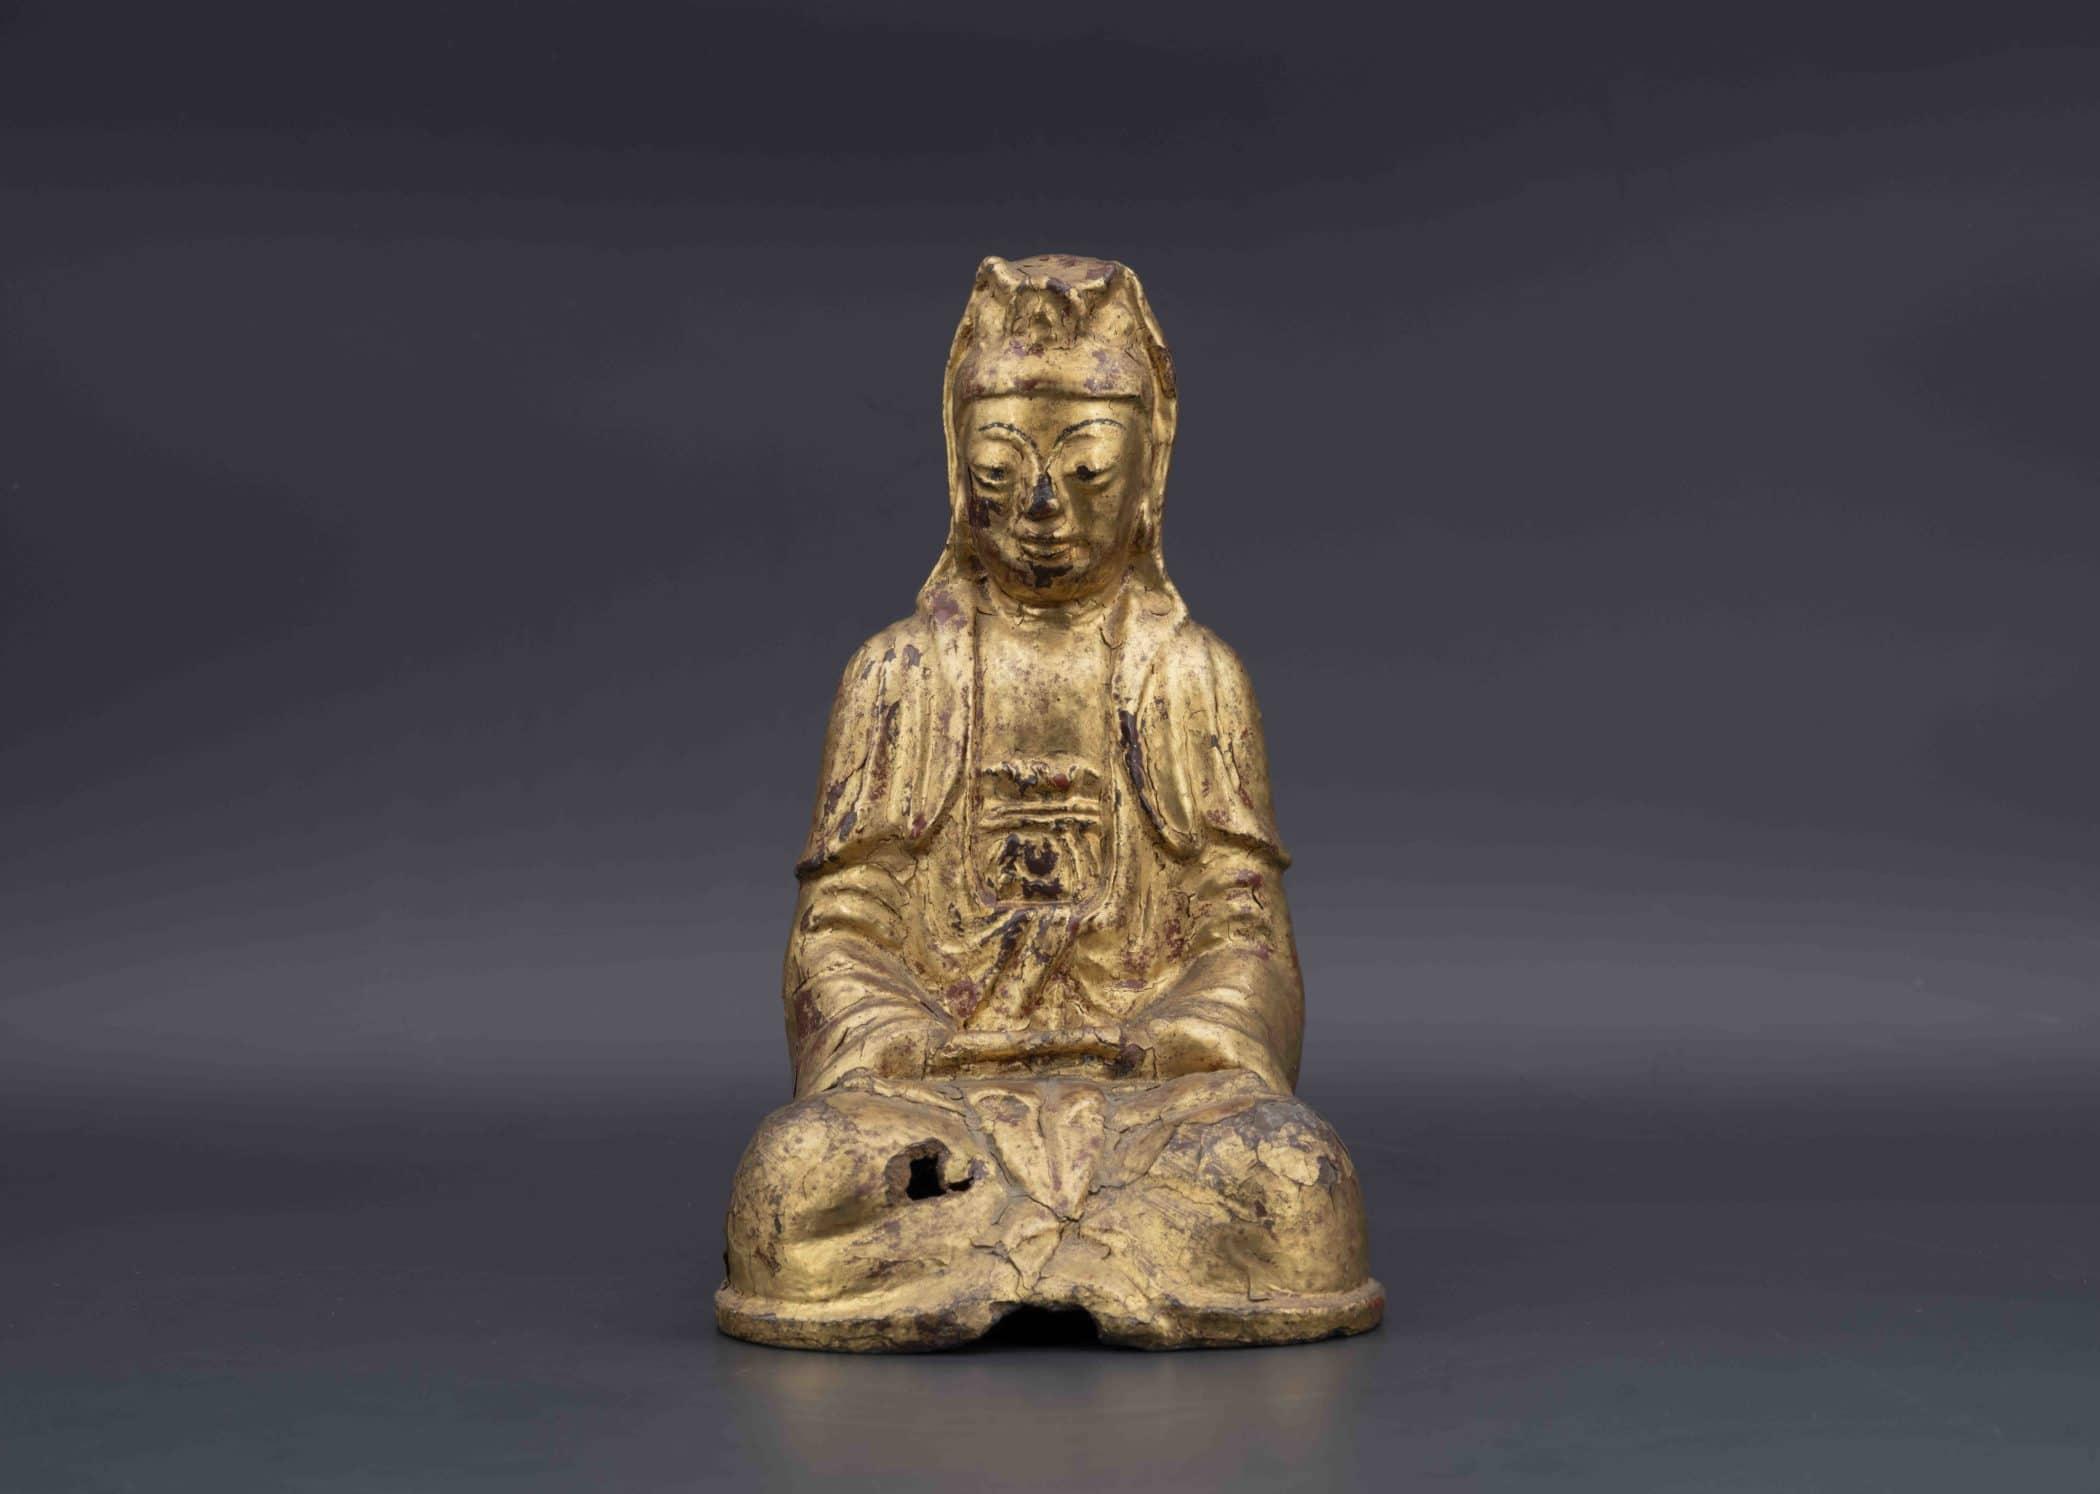 Bronze laqué or. Chine, XVIIIe siècle